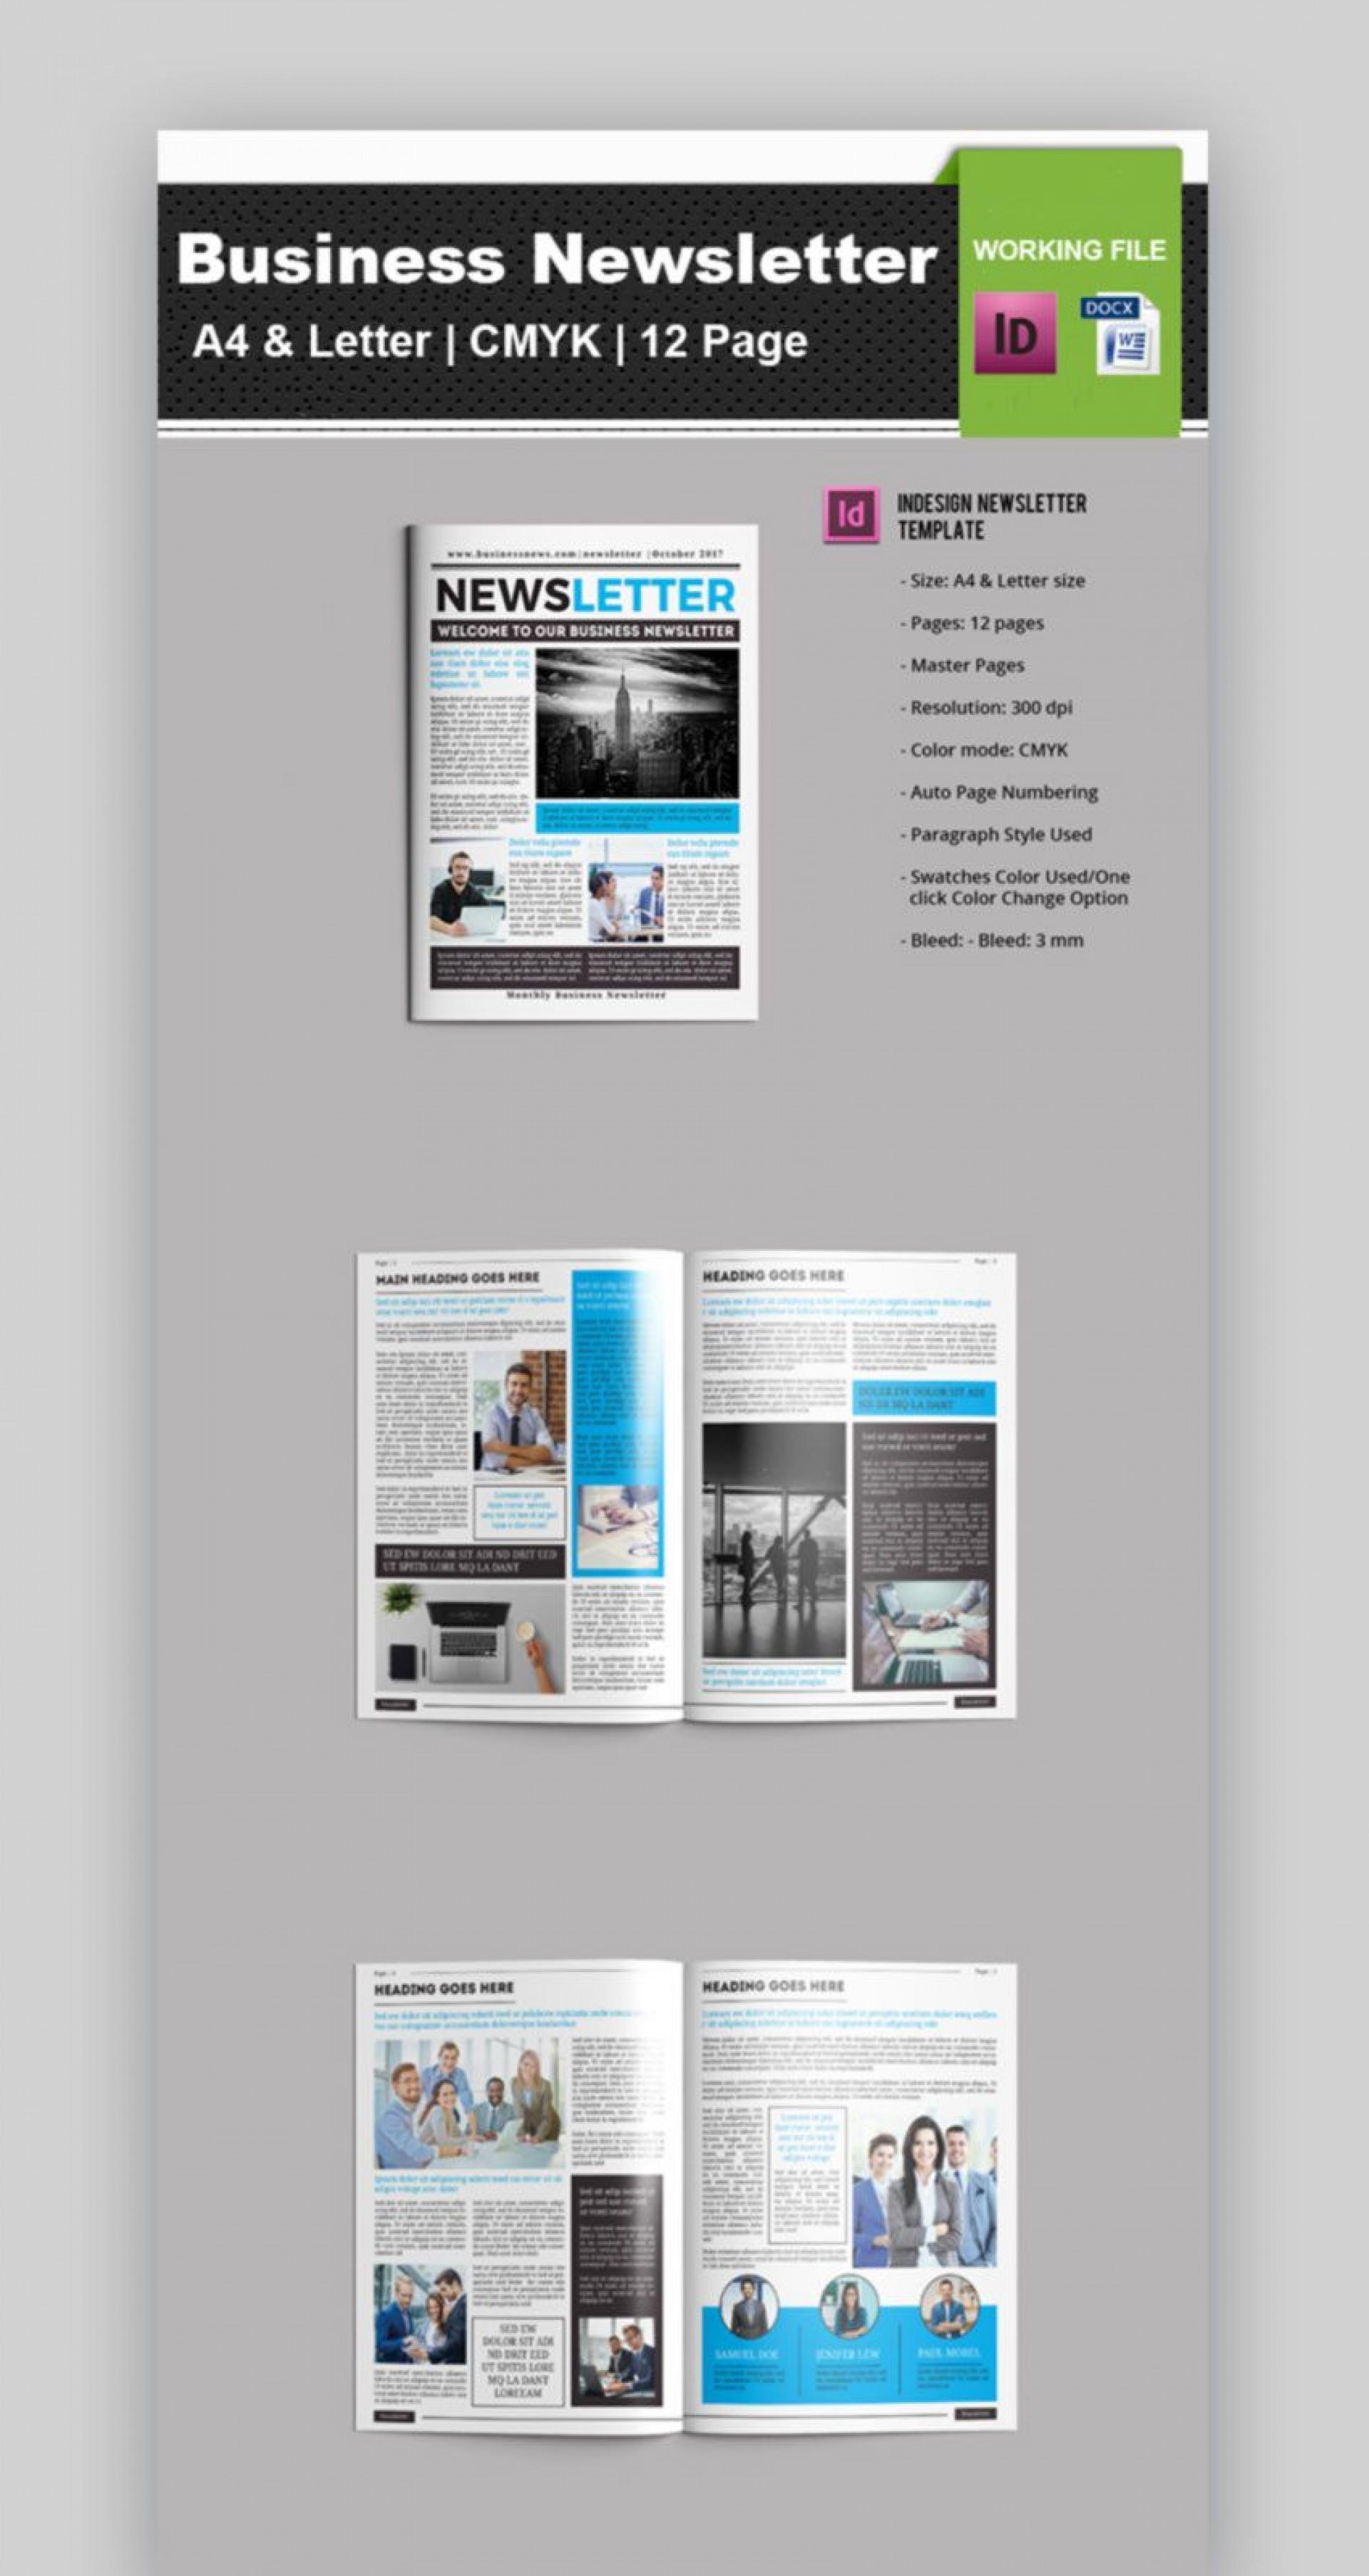 006 Sensational Publisher Newsletter Template Free Inspiration  Microsoft Office Download1920